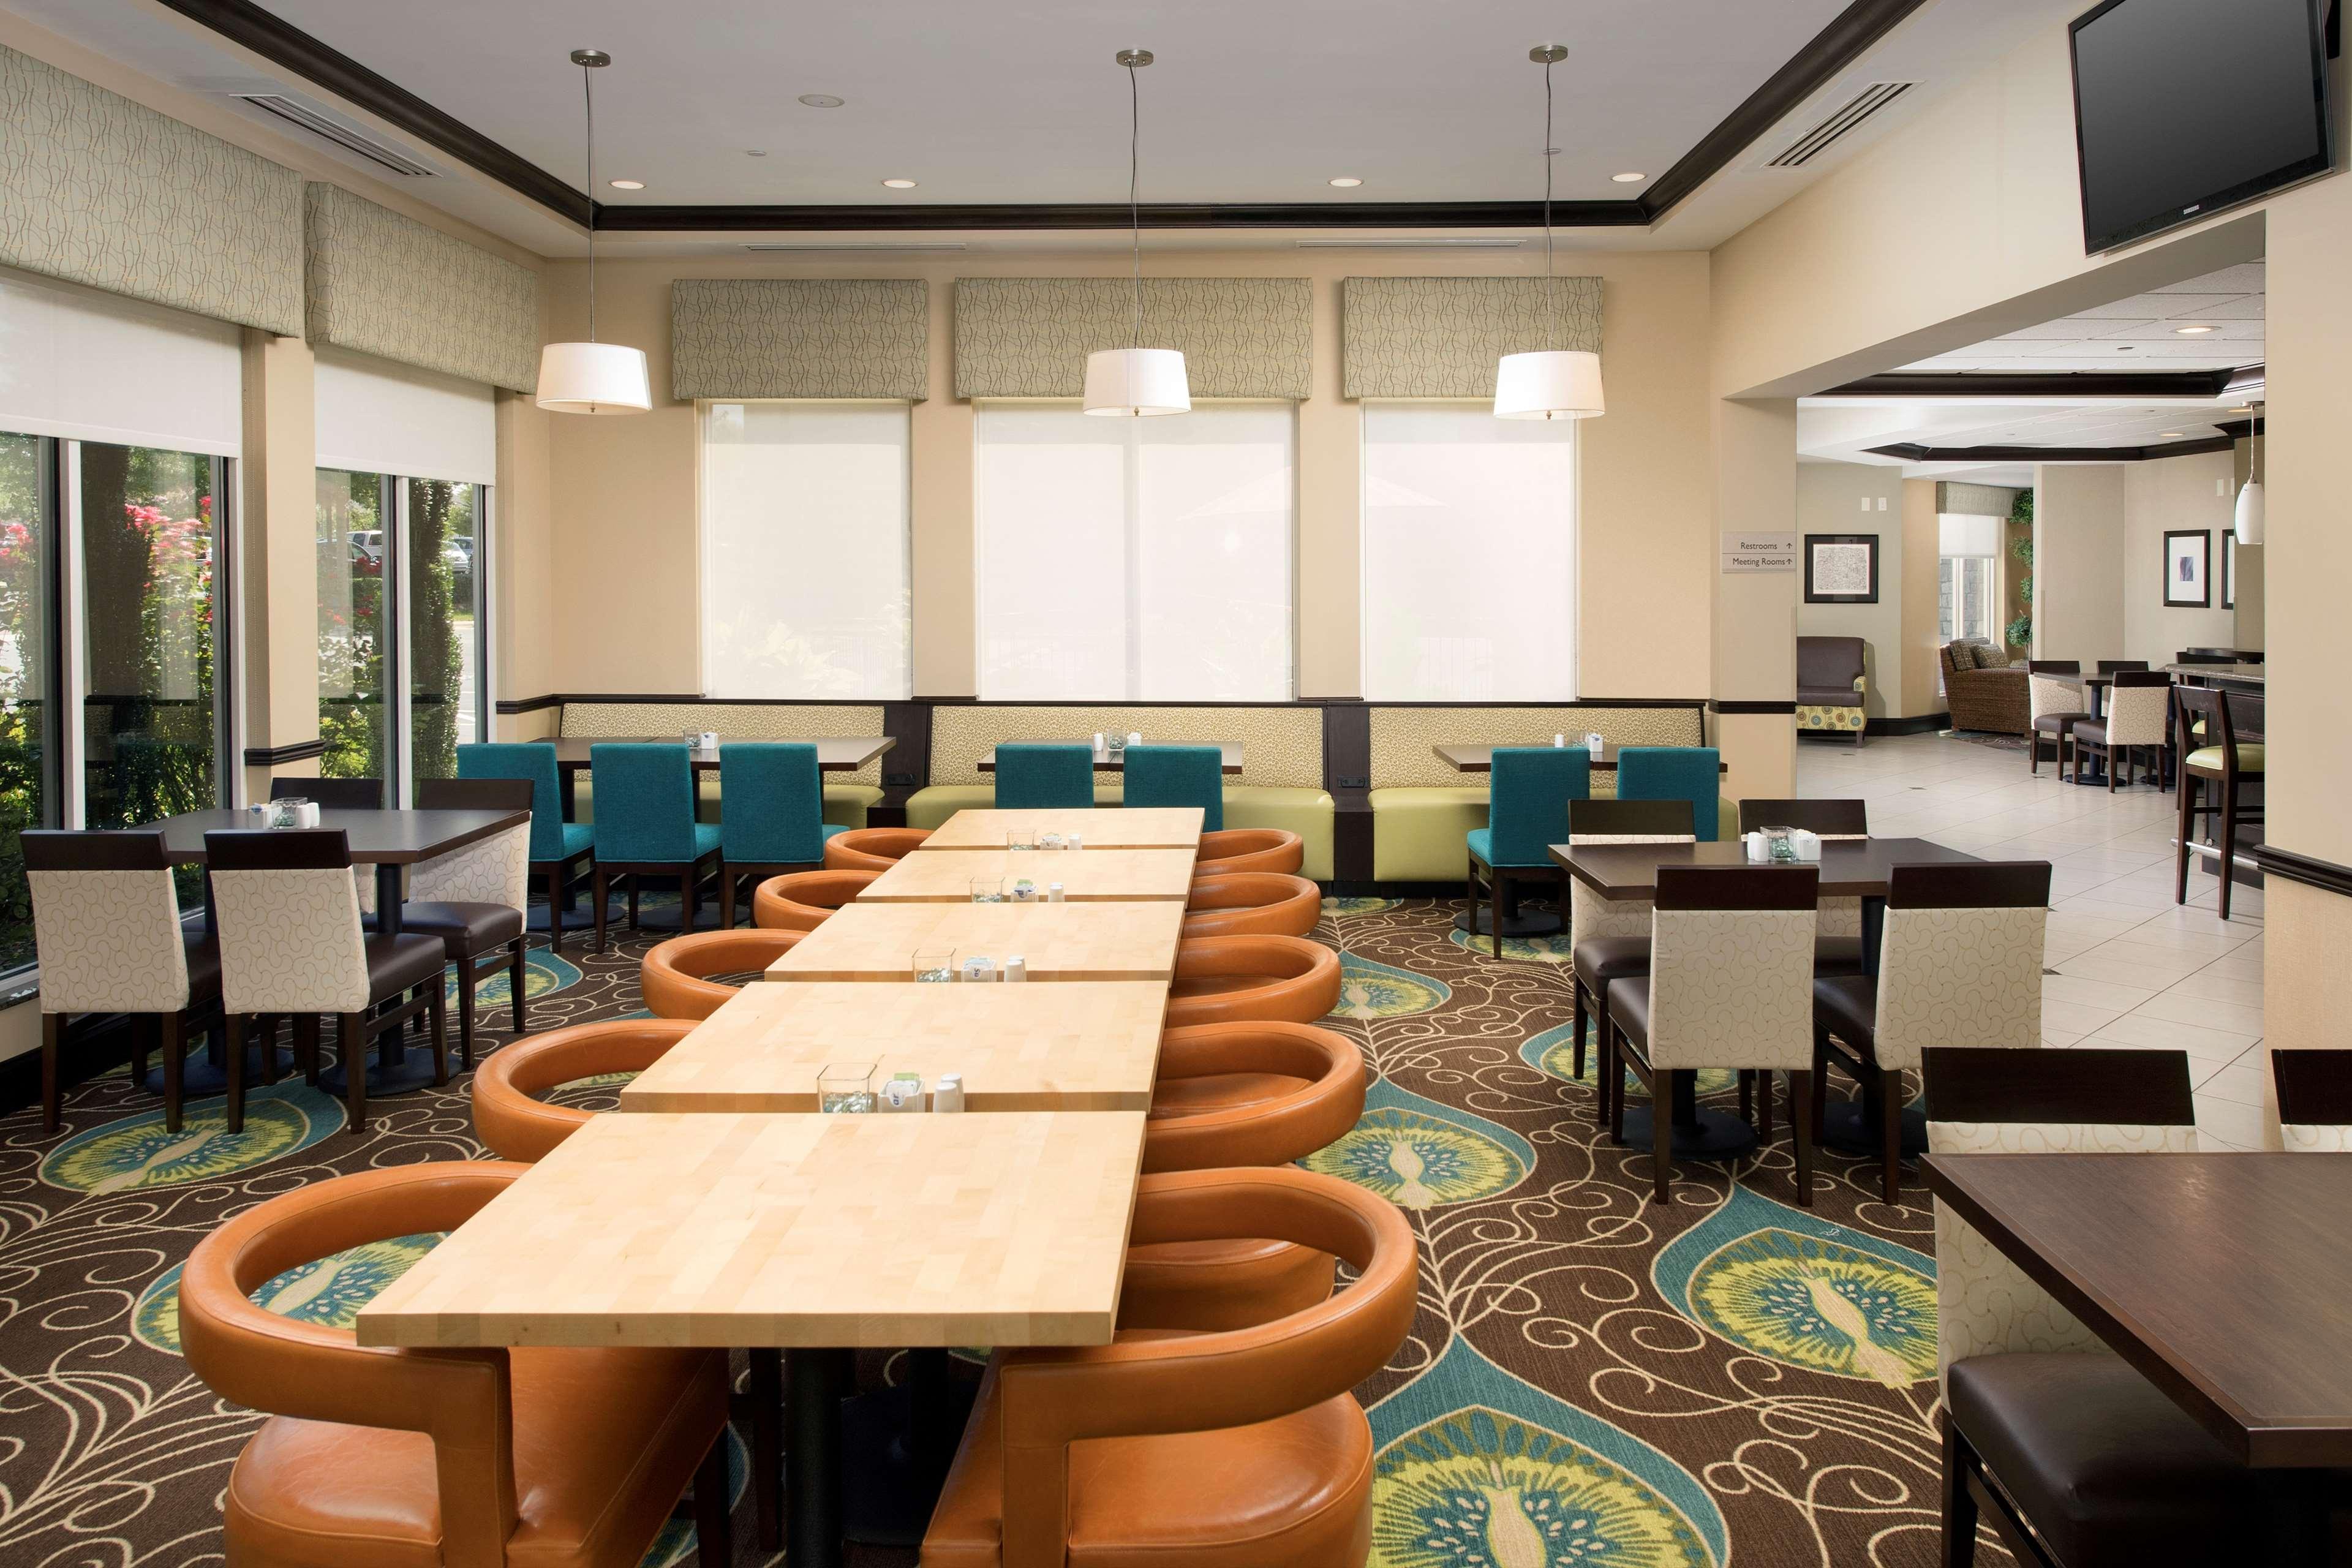 Hilton Garden Inn Winston-Salem/Hanes Mall image 9